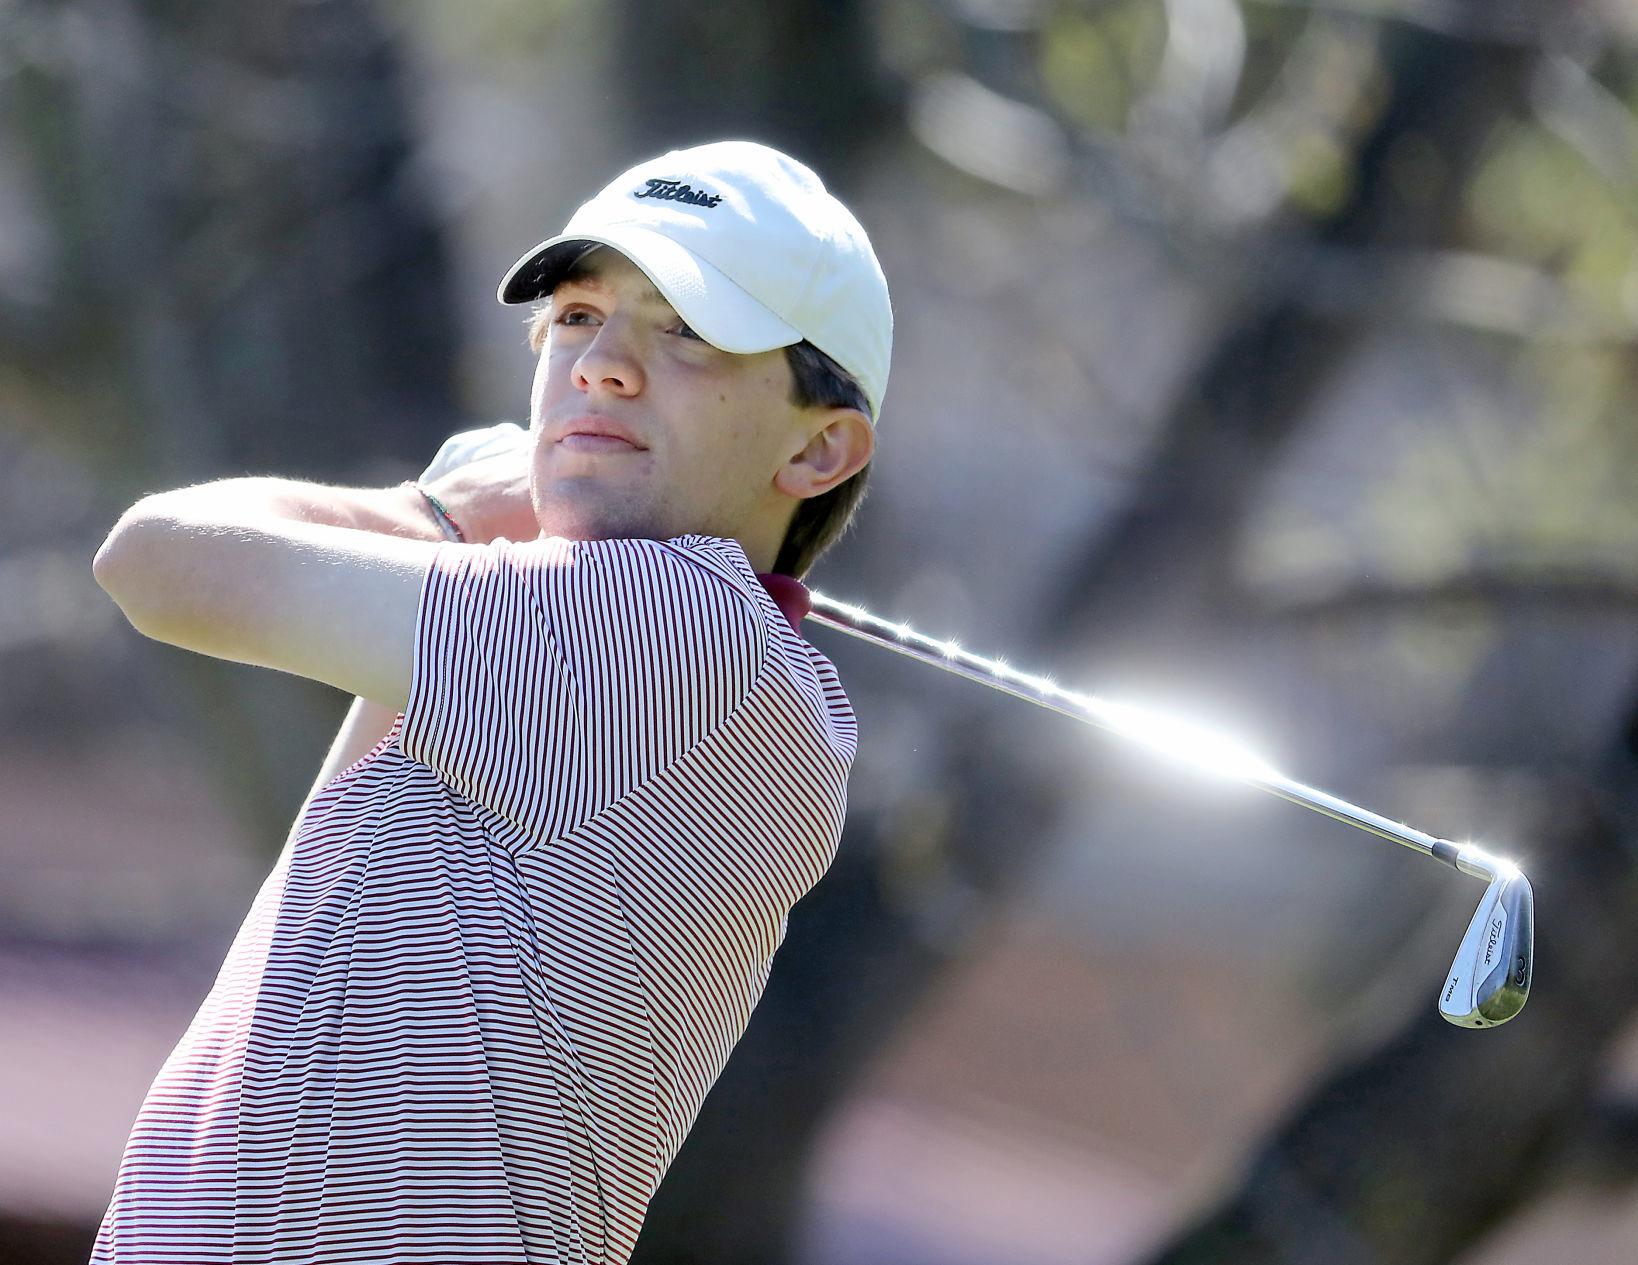 WIAA boys golf photo: Madison Edgewood's James Gilmore